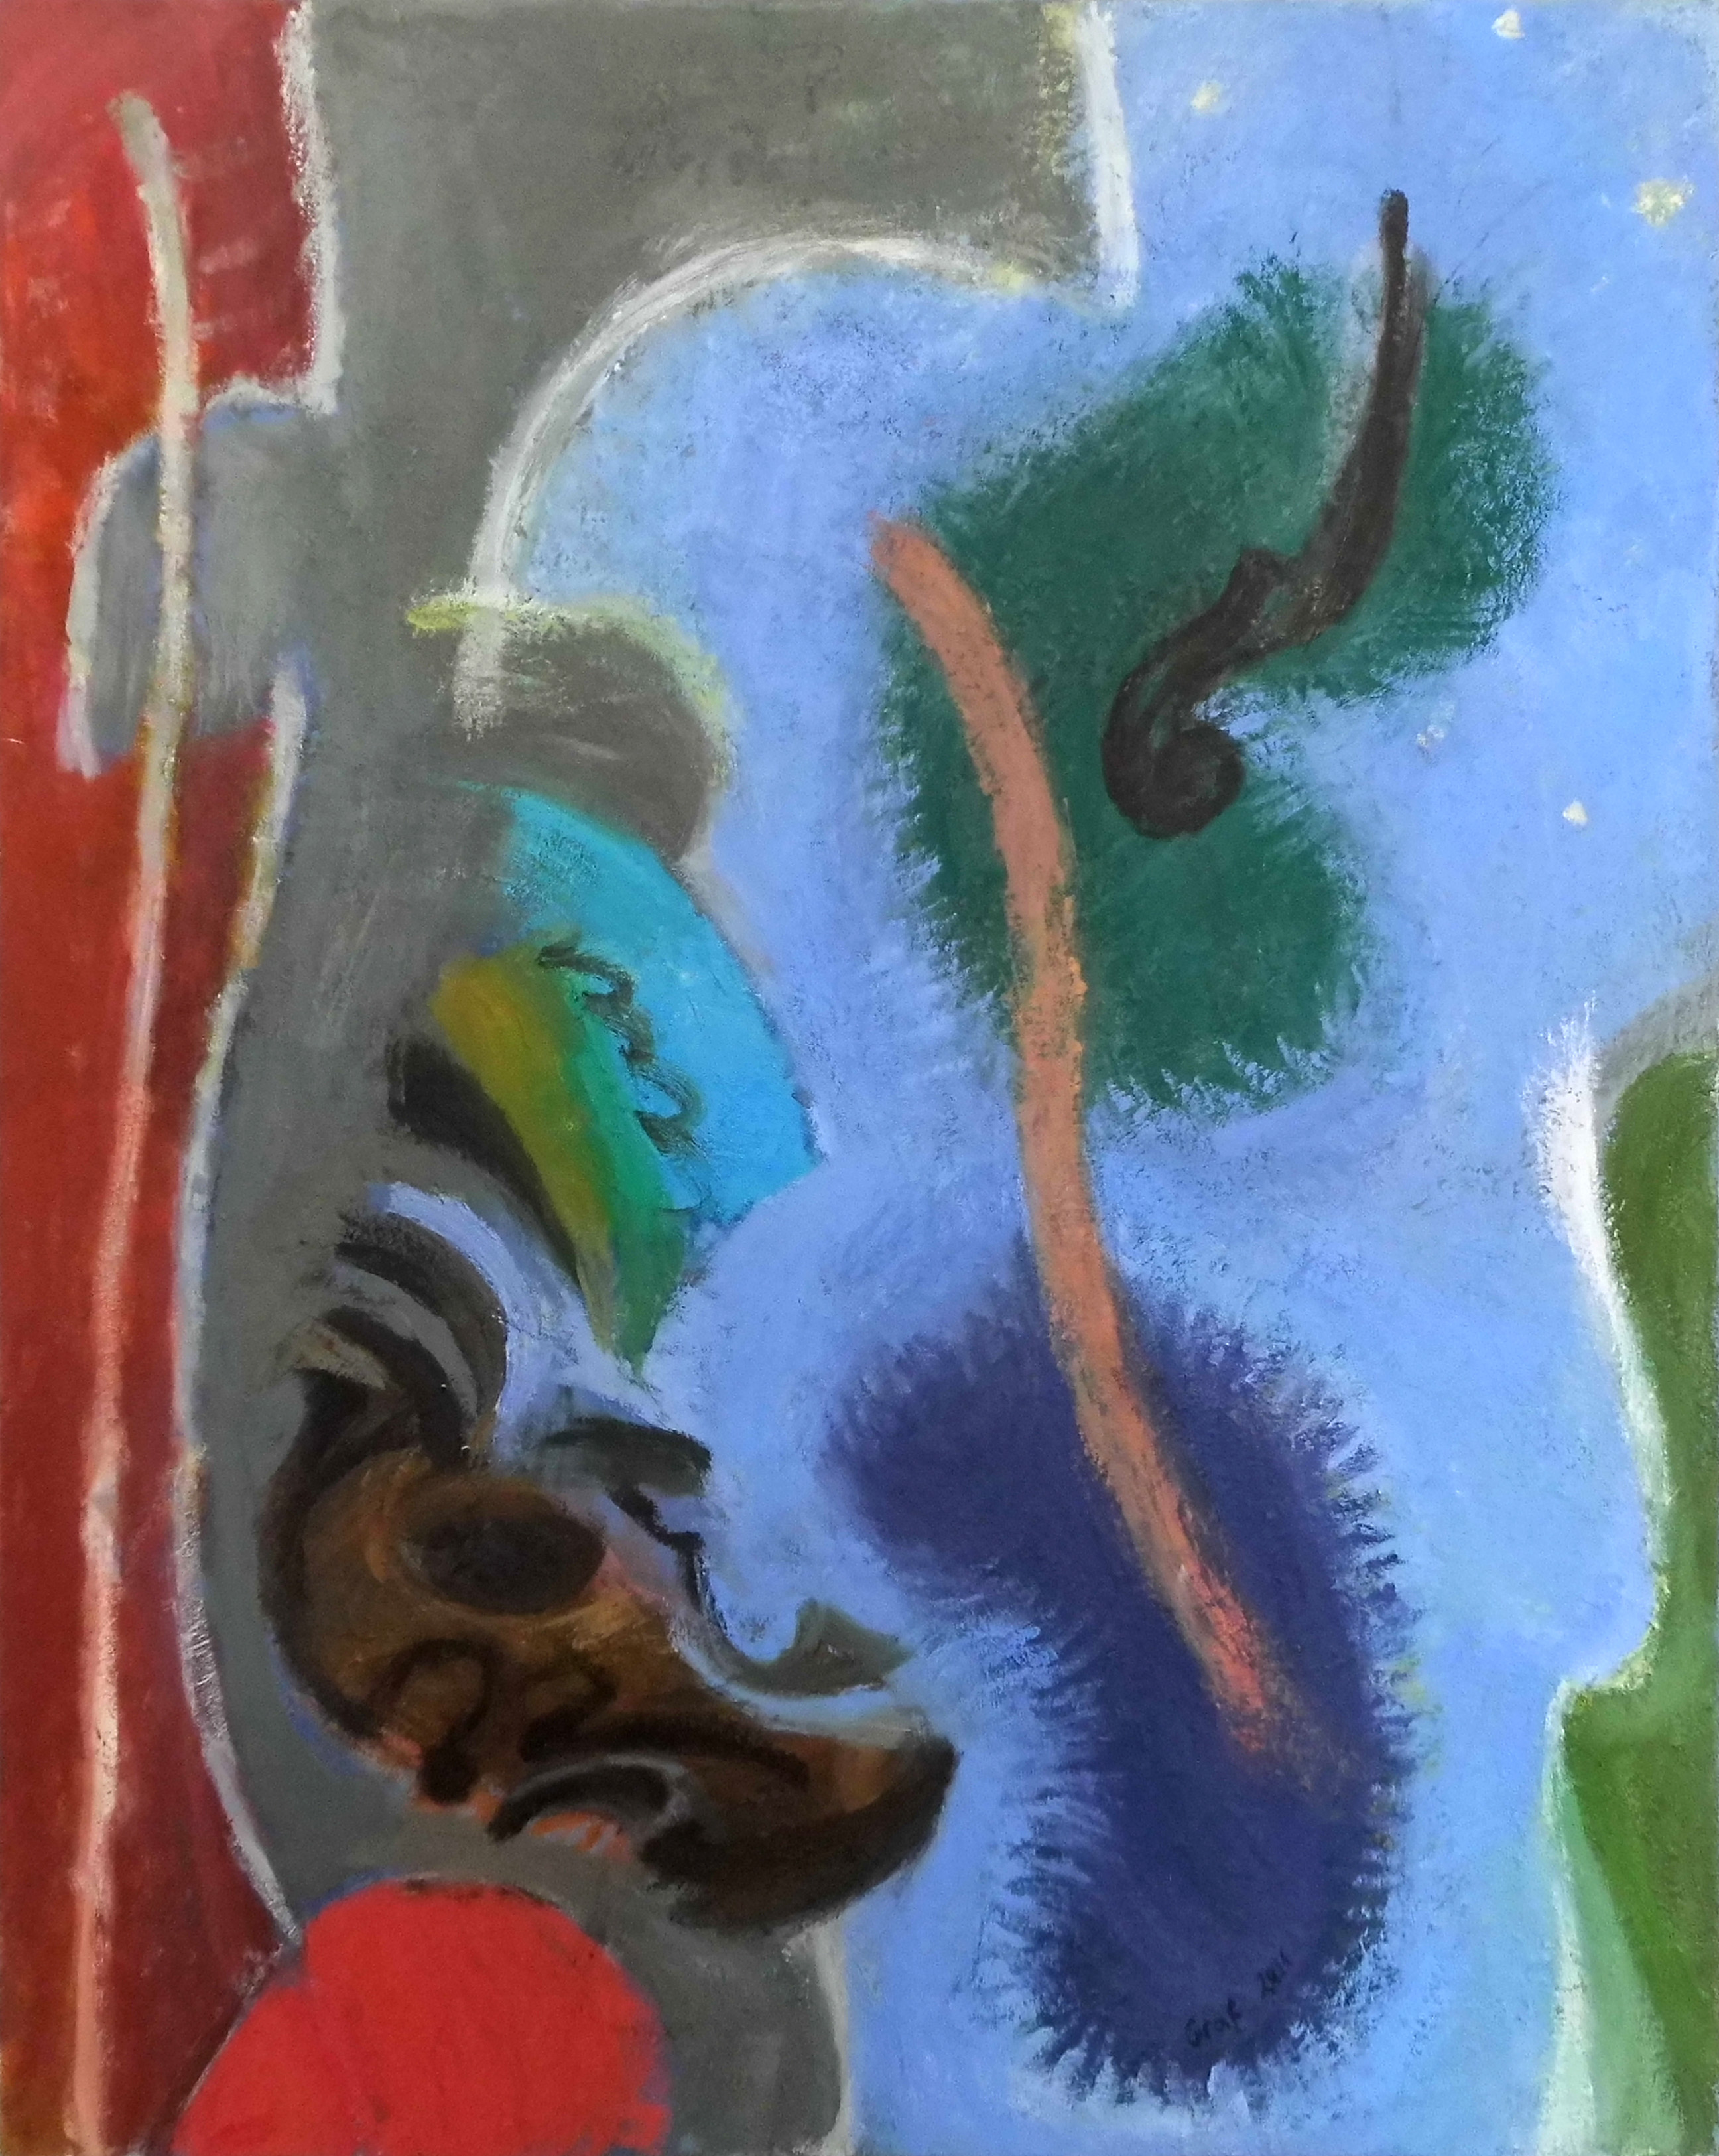 12-Peter Graf-Geigen im Himmel, Geigen Im A…-2011-Öl auf Leinwand-100x80